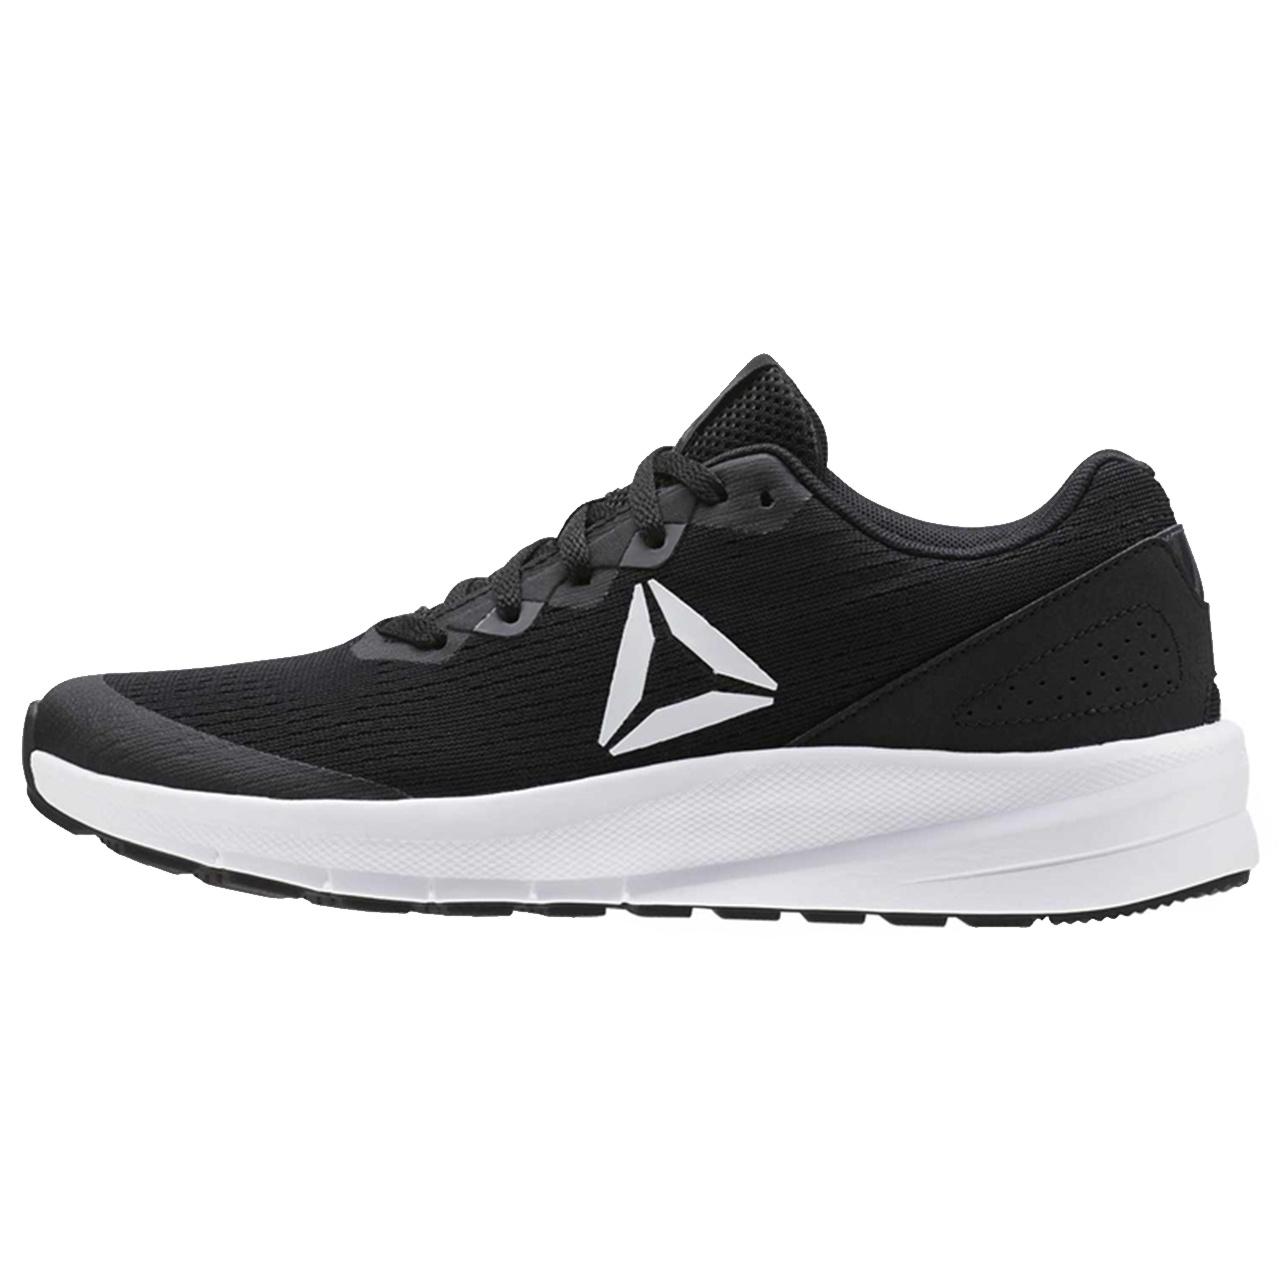 کفش مخصوص دویدن زنانه ریباک مدل Runner 3.0 - CN5223